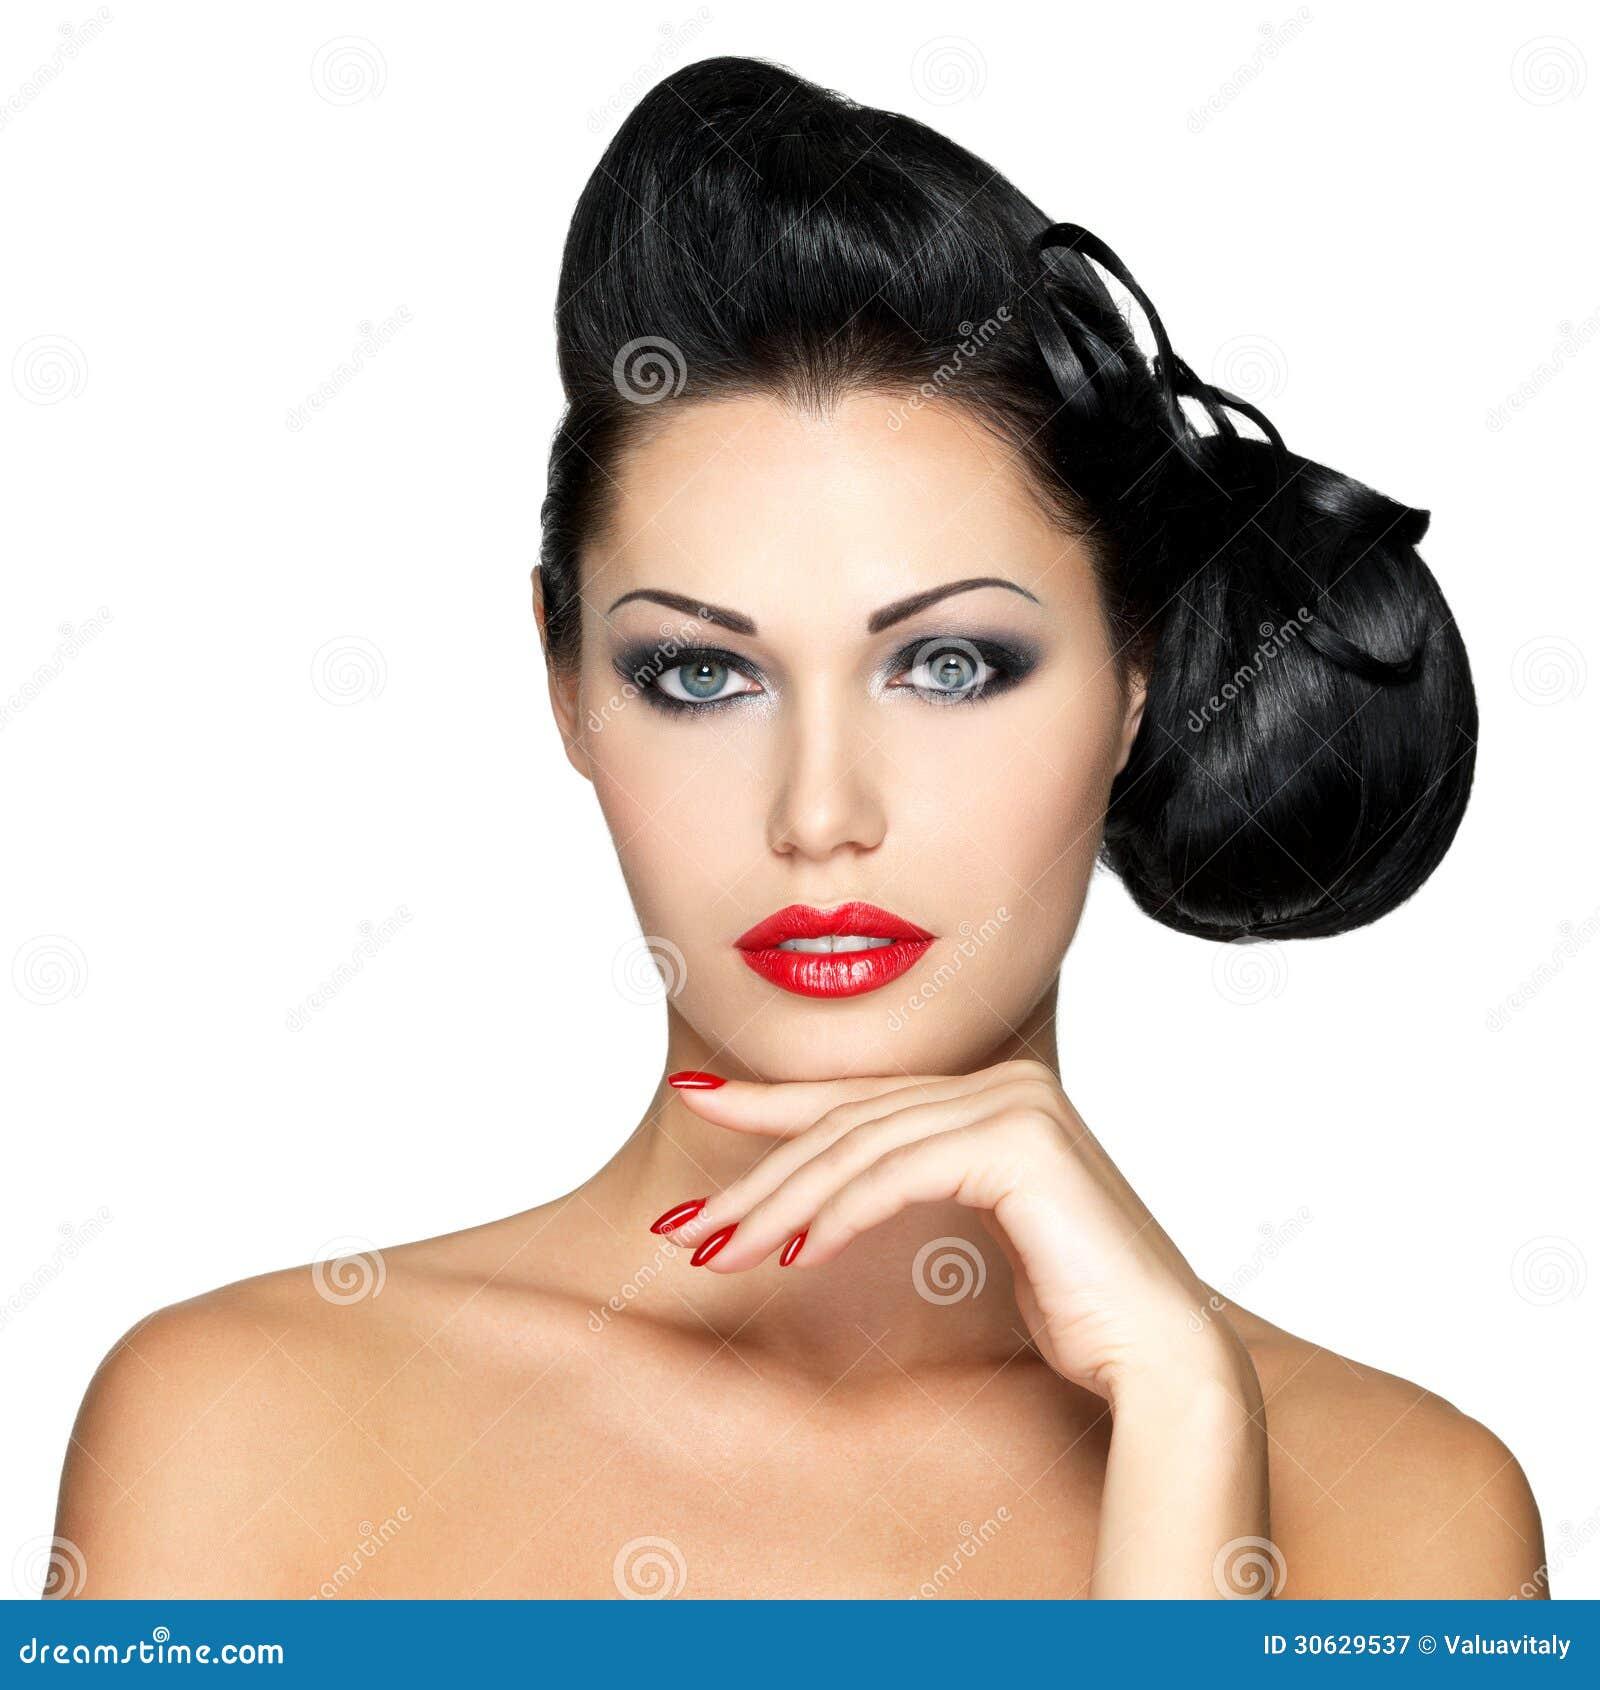 hairstyle background - photo #8